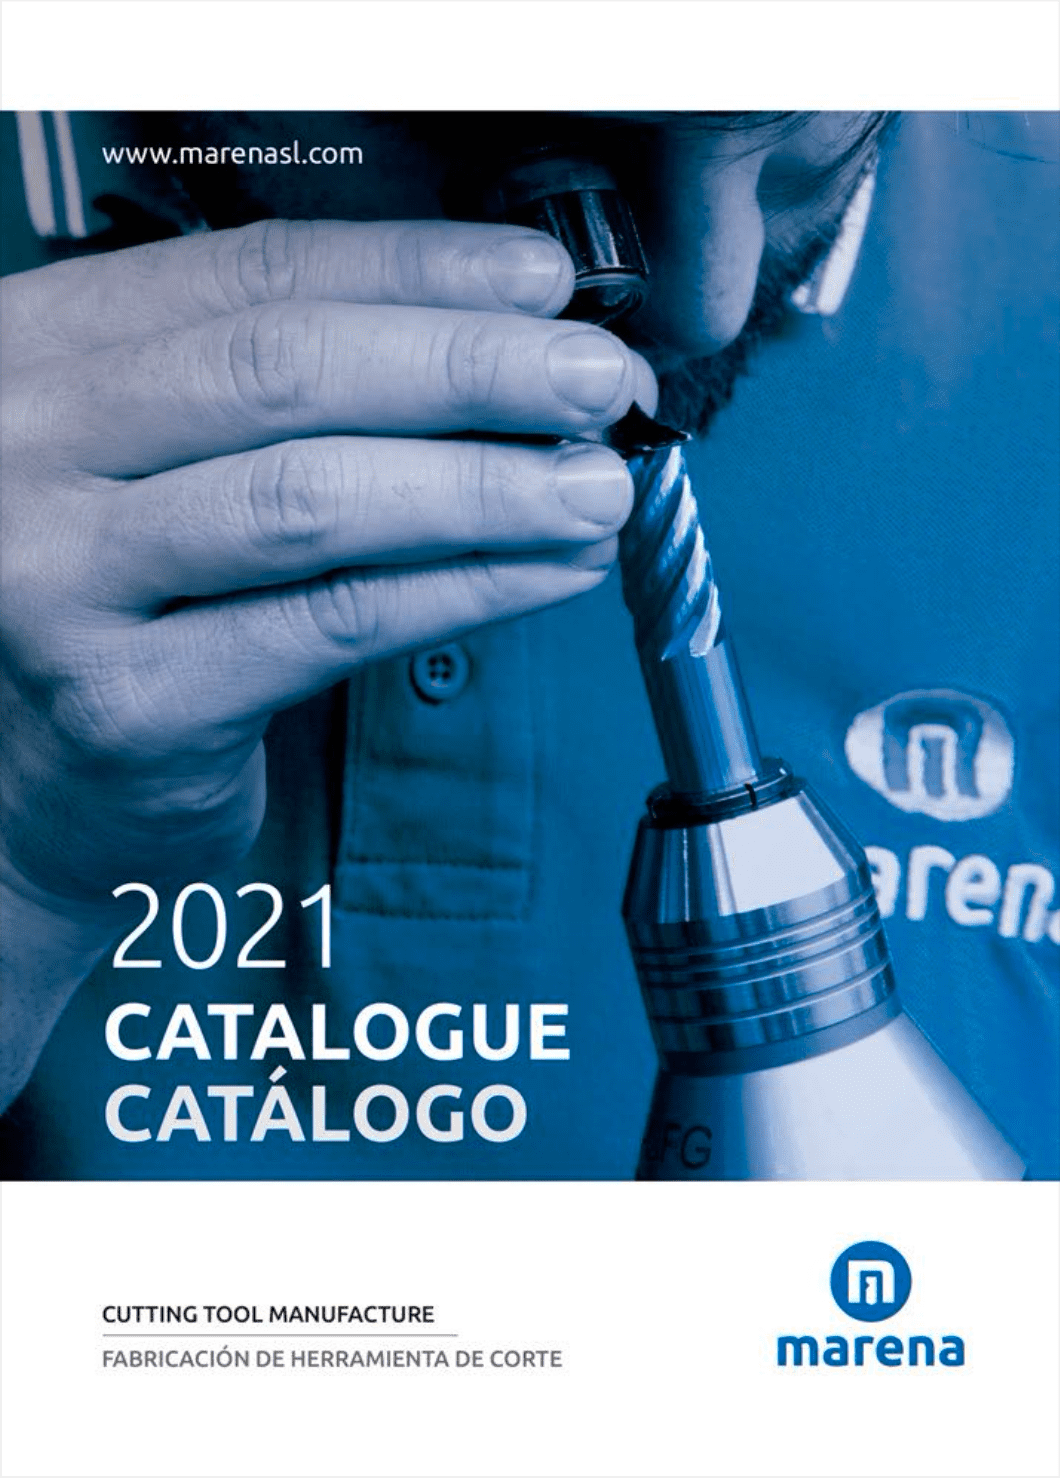 Catalogo Marena